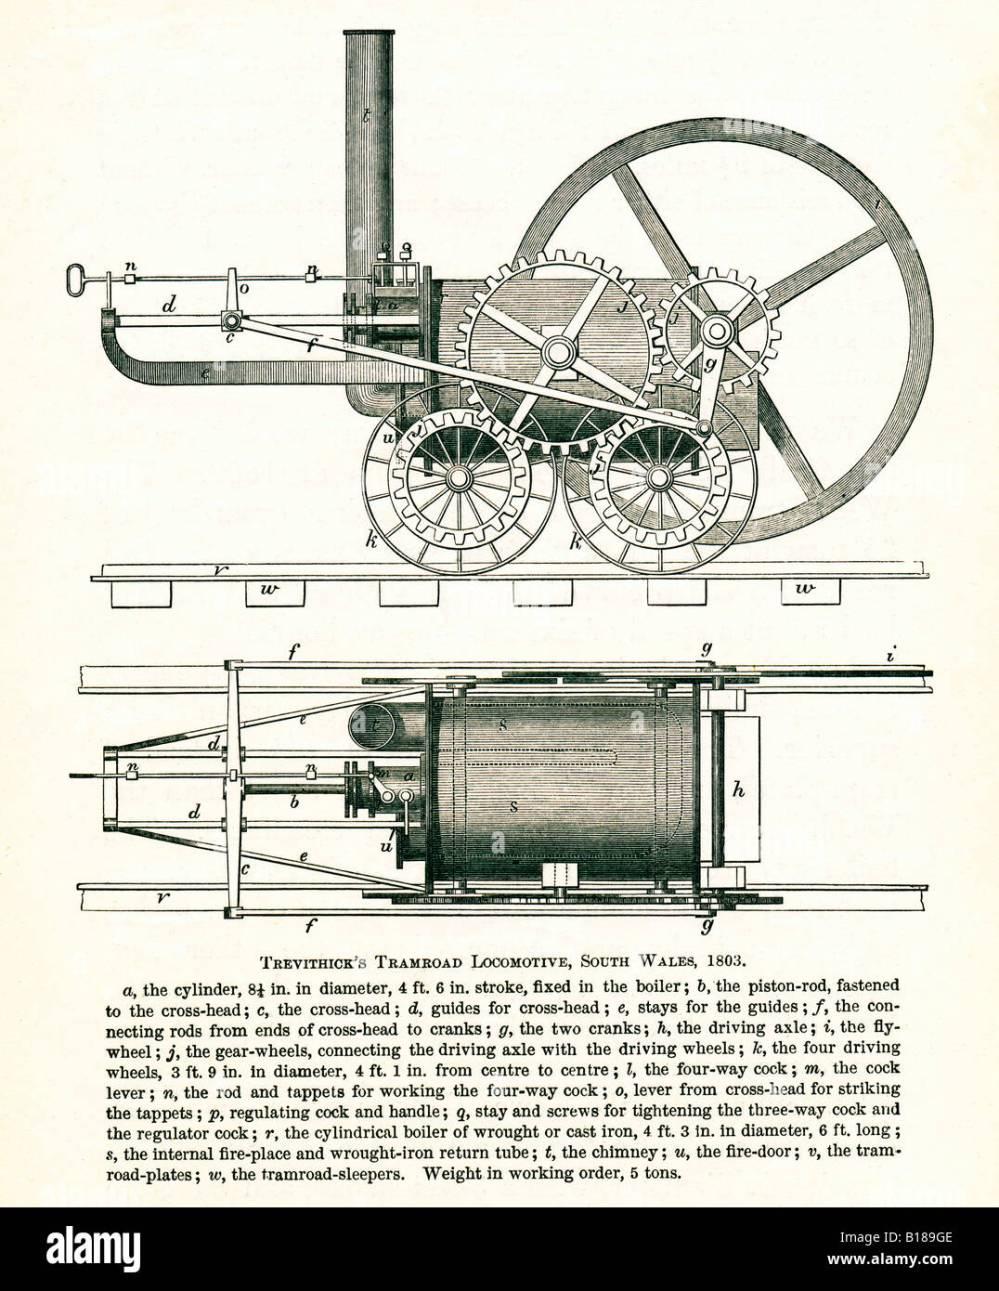 medium resolution of trevithick tramroad locomotive 1803 the first steam engine on tracks run at the penydarran ironworks merthyr tydfil